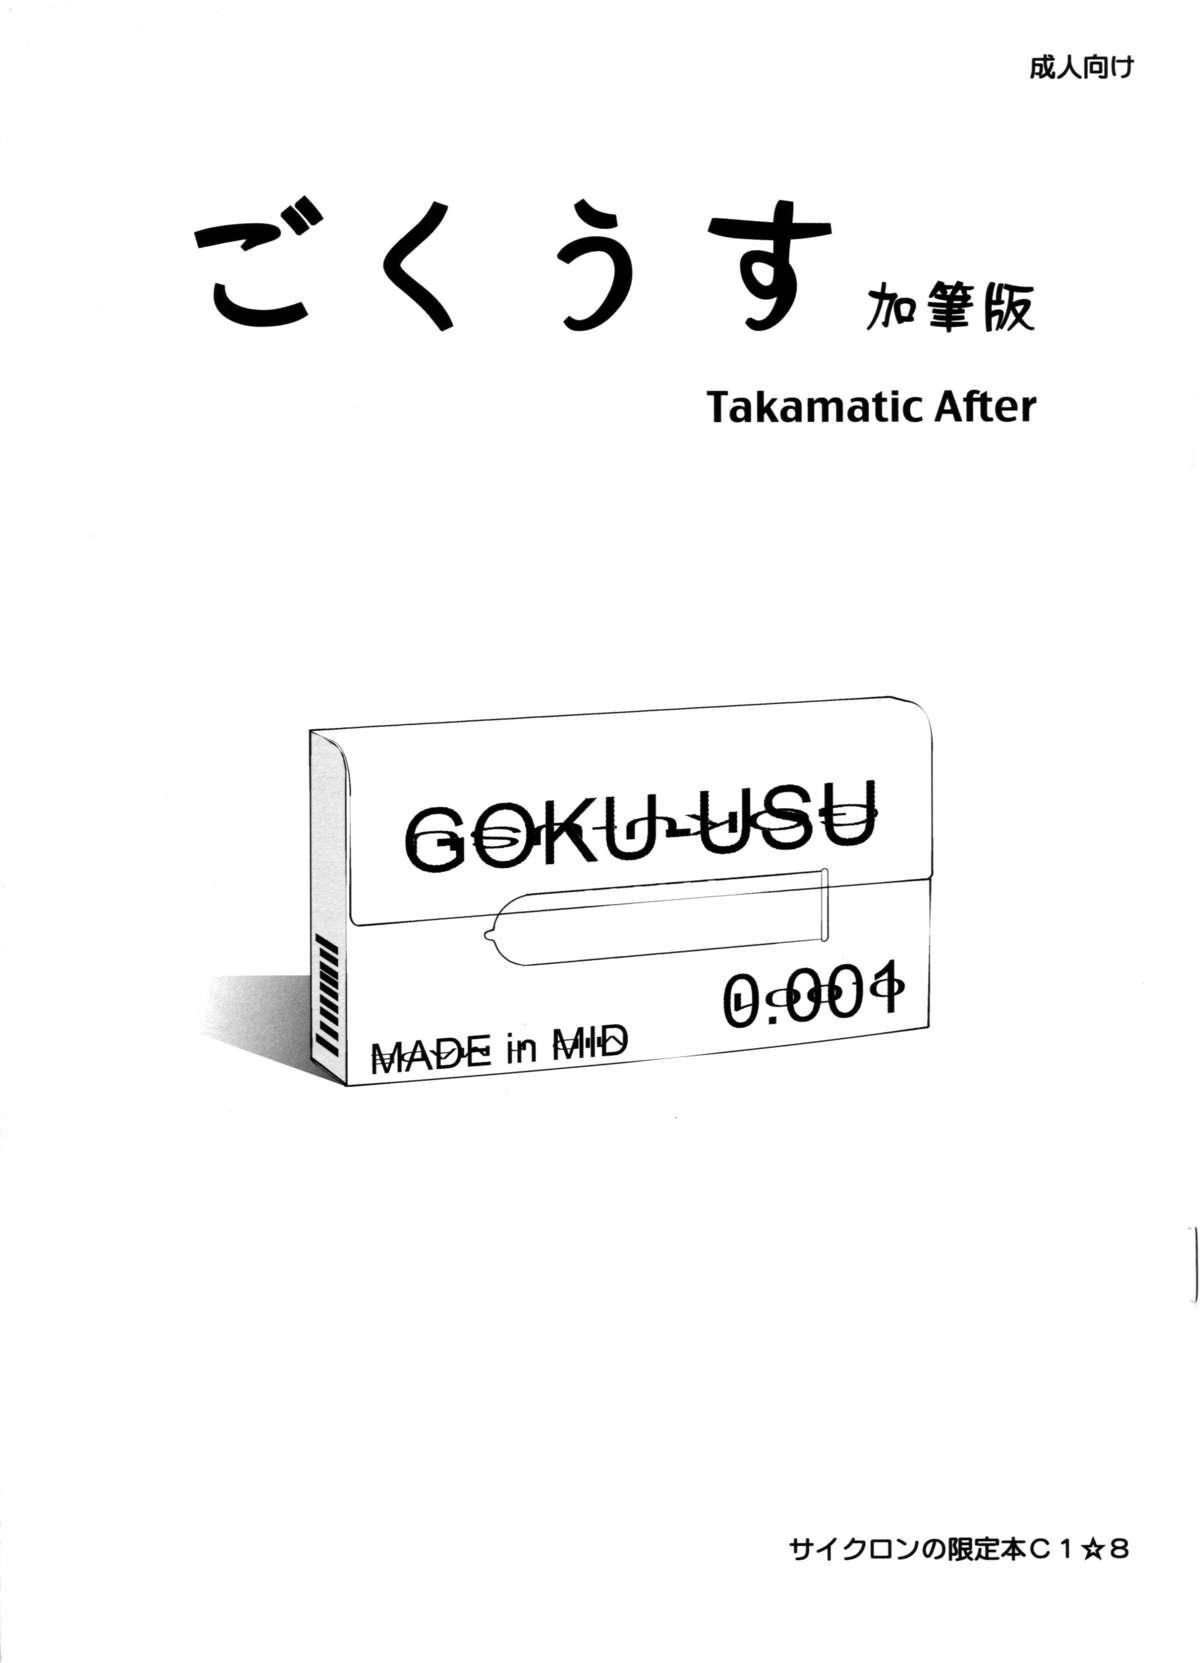 Gokuusu Kahitsuban Takamatic After 0